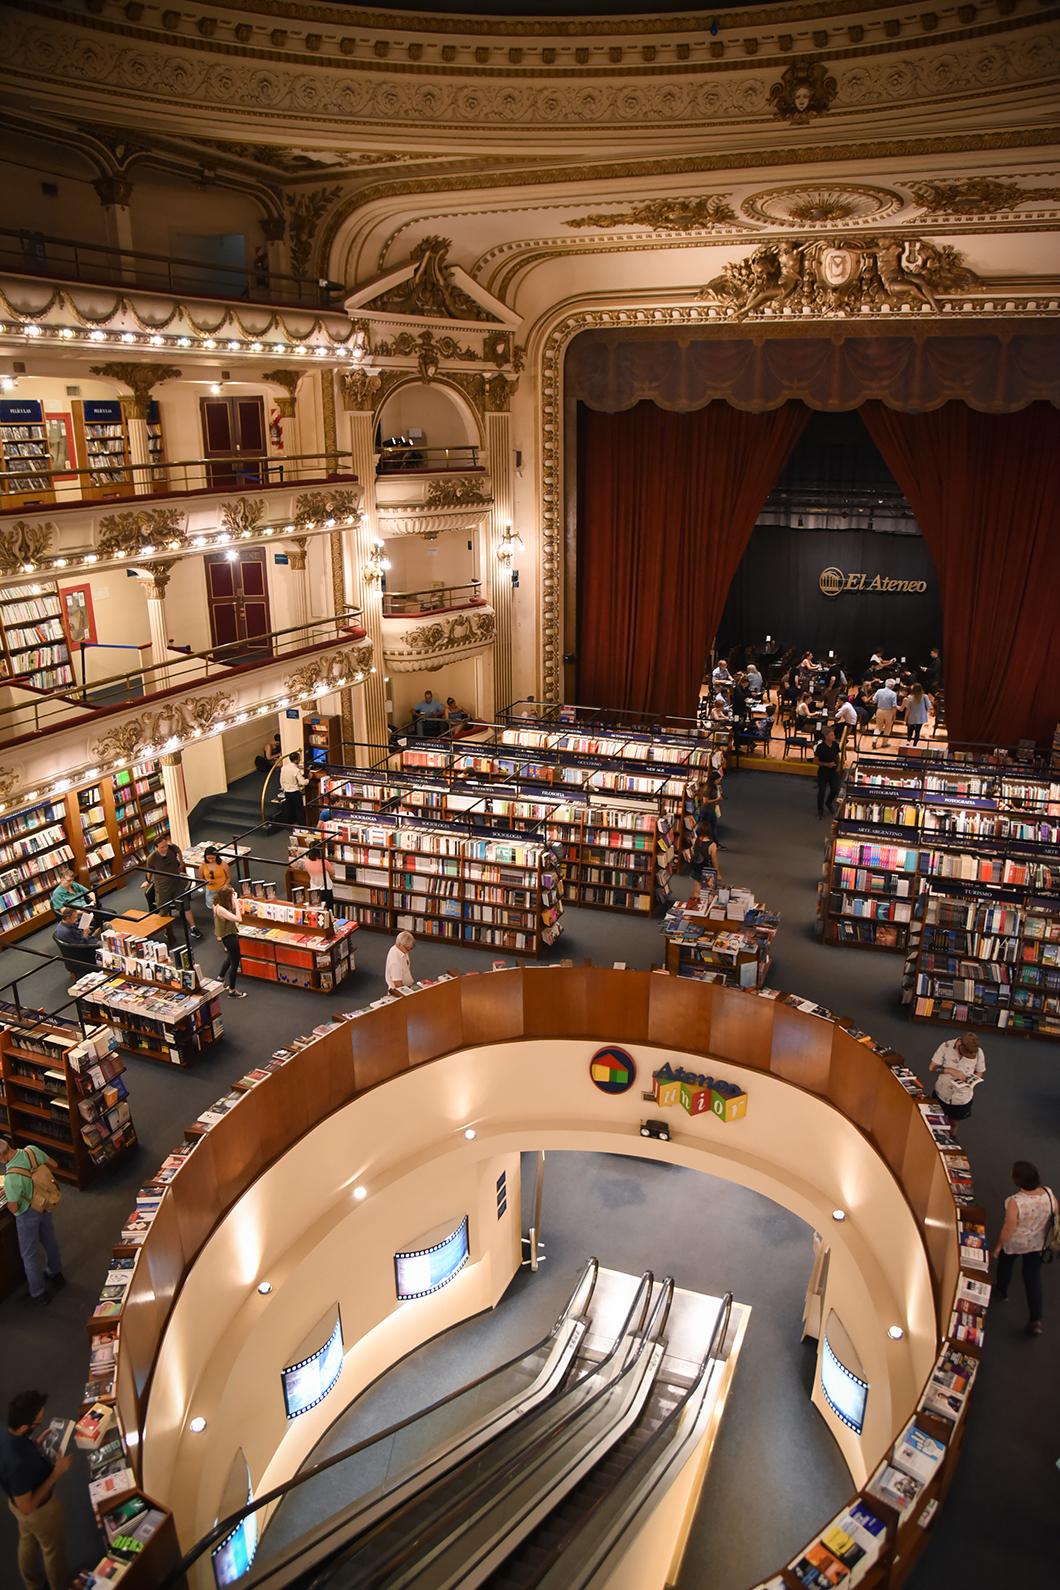 La librairie El Ateneo Grand Splendid